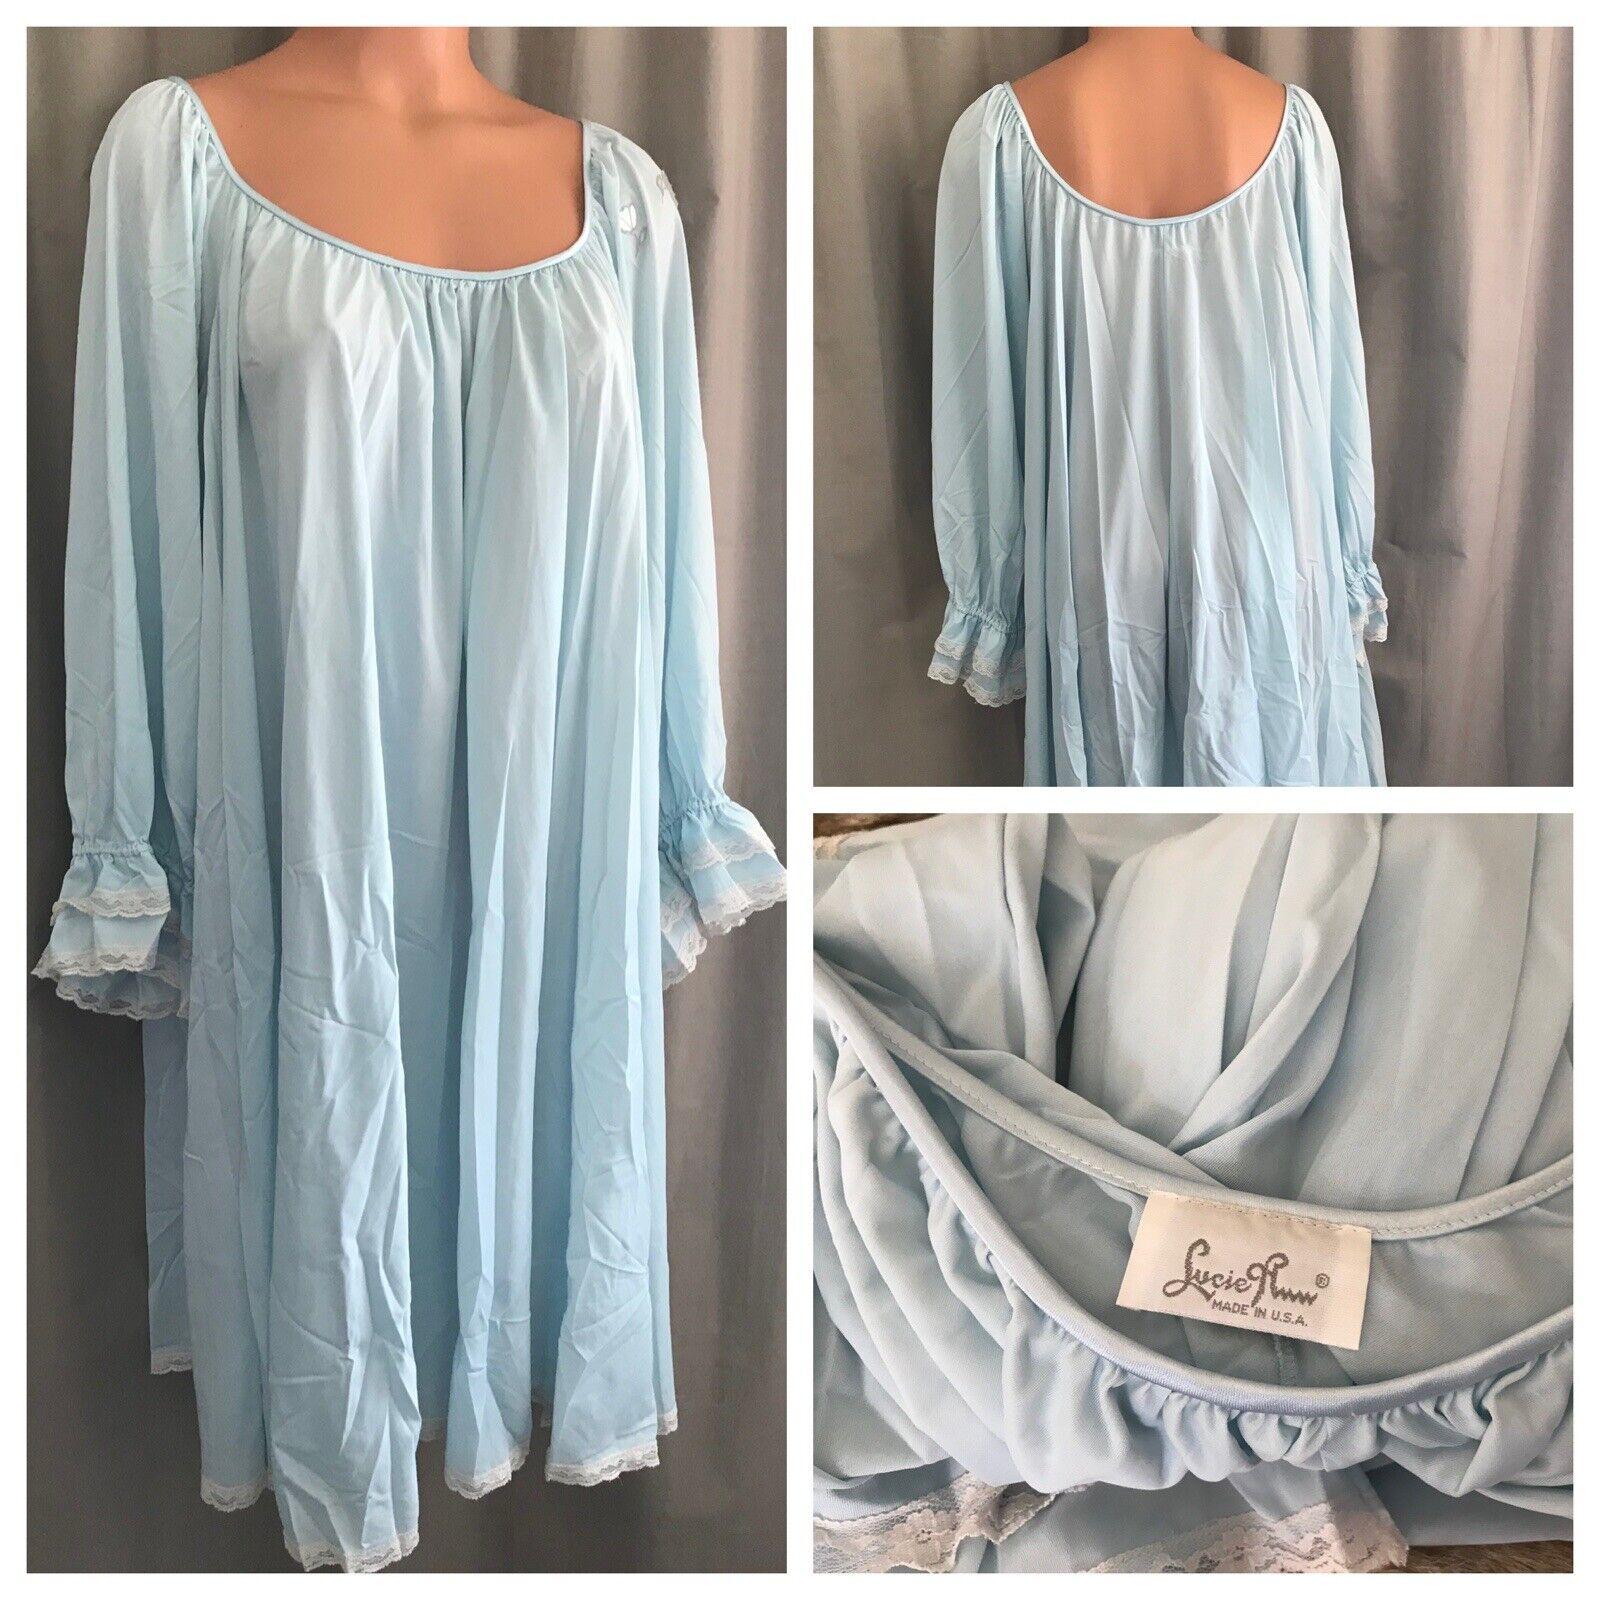 Vintage Lucie Ann Nightgown Powder Blue Nylon Bab… - image 1